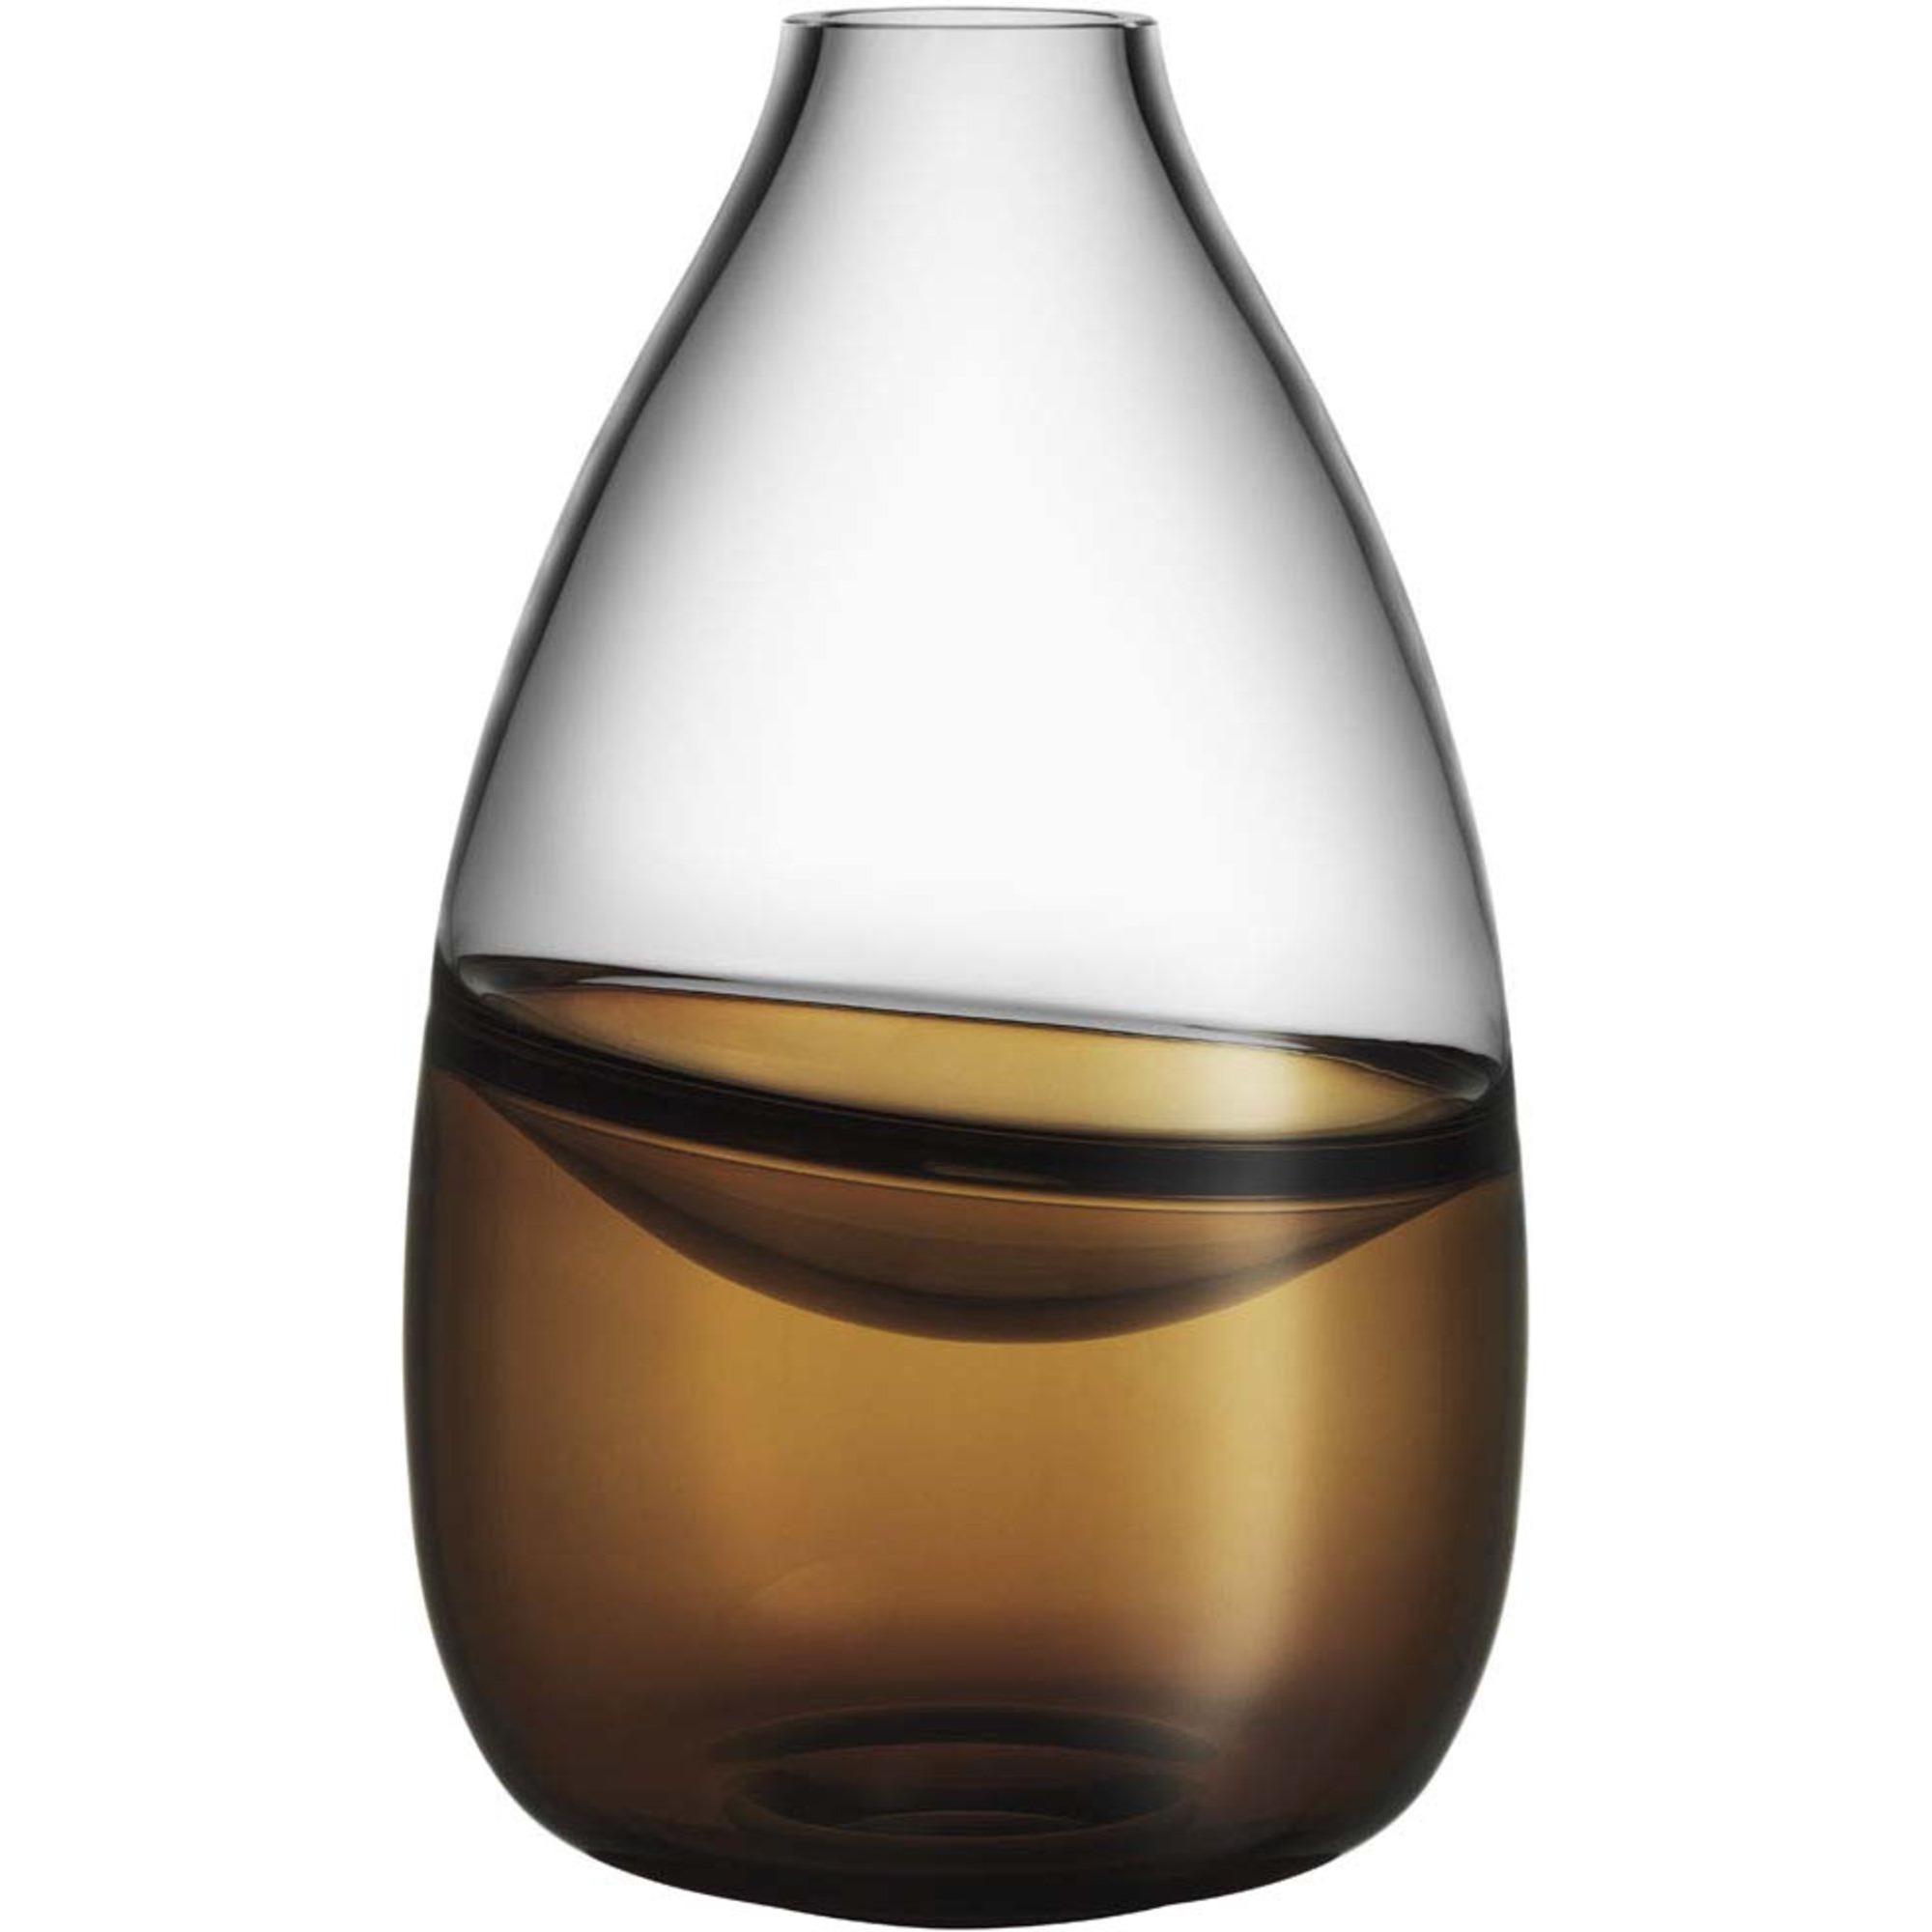 Kosta Boda Septum Guldbrun Vas Limited Edition